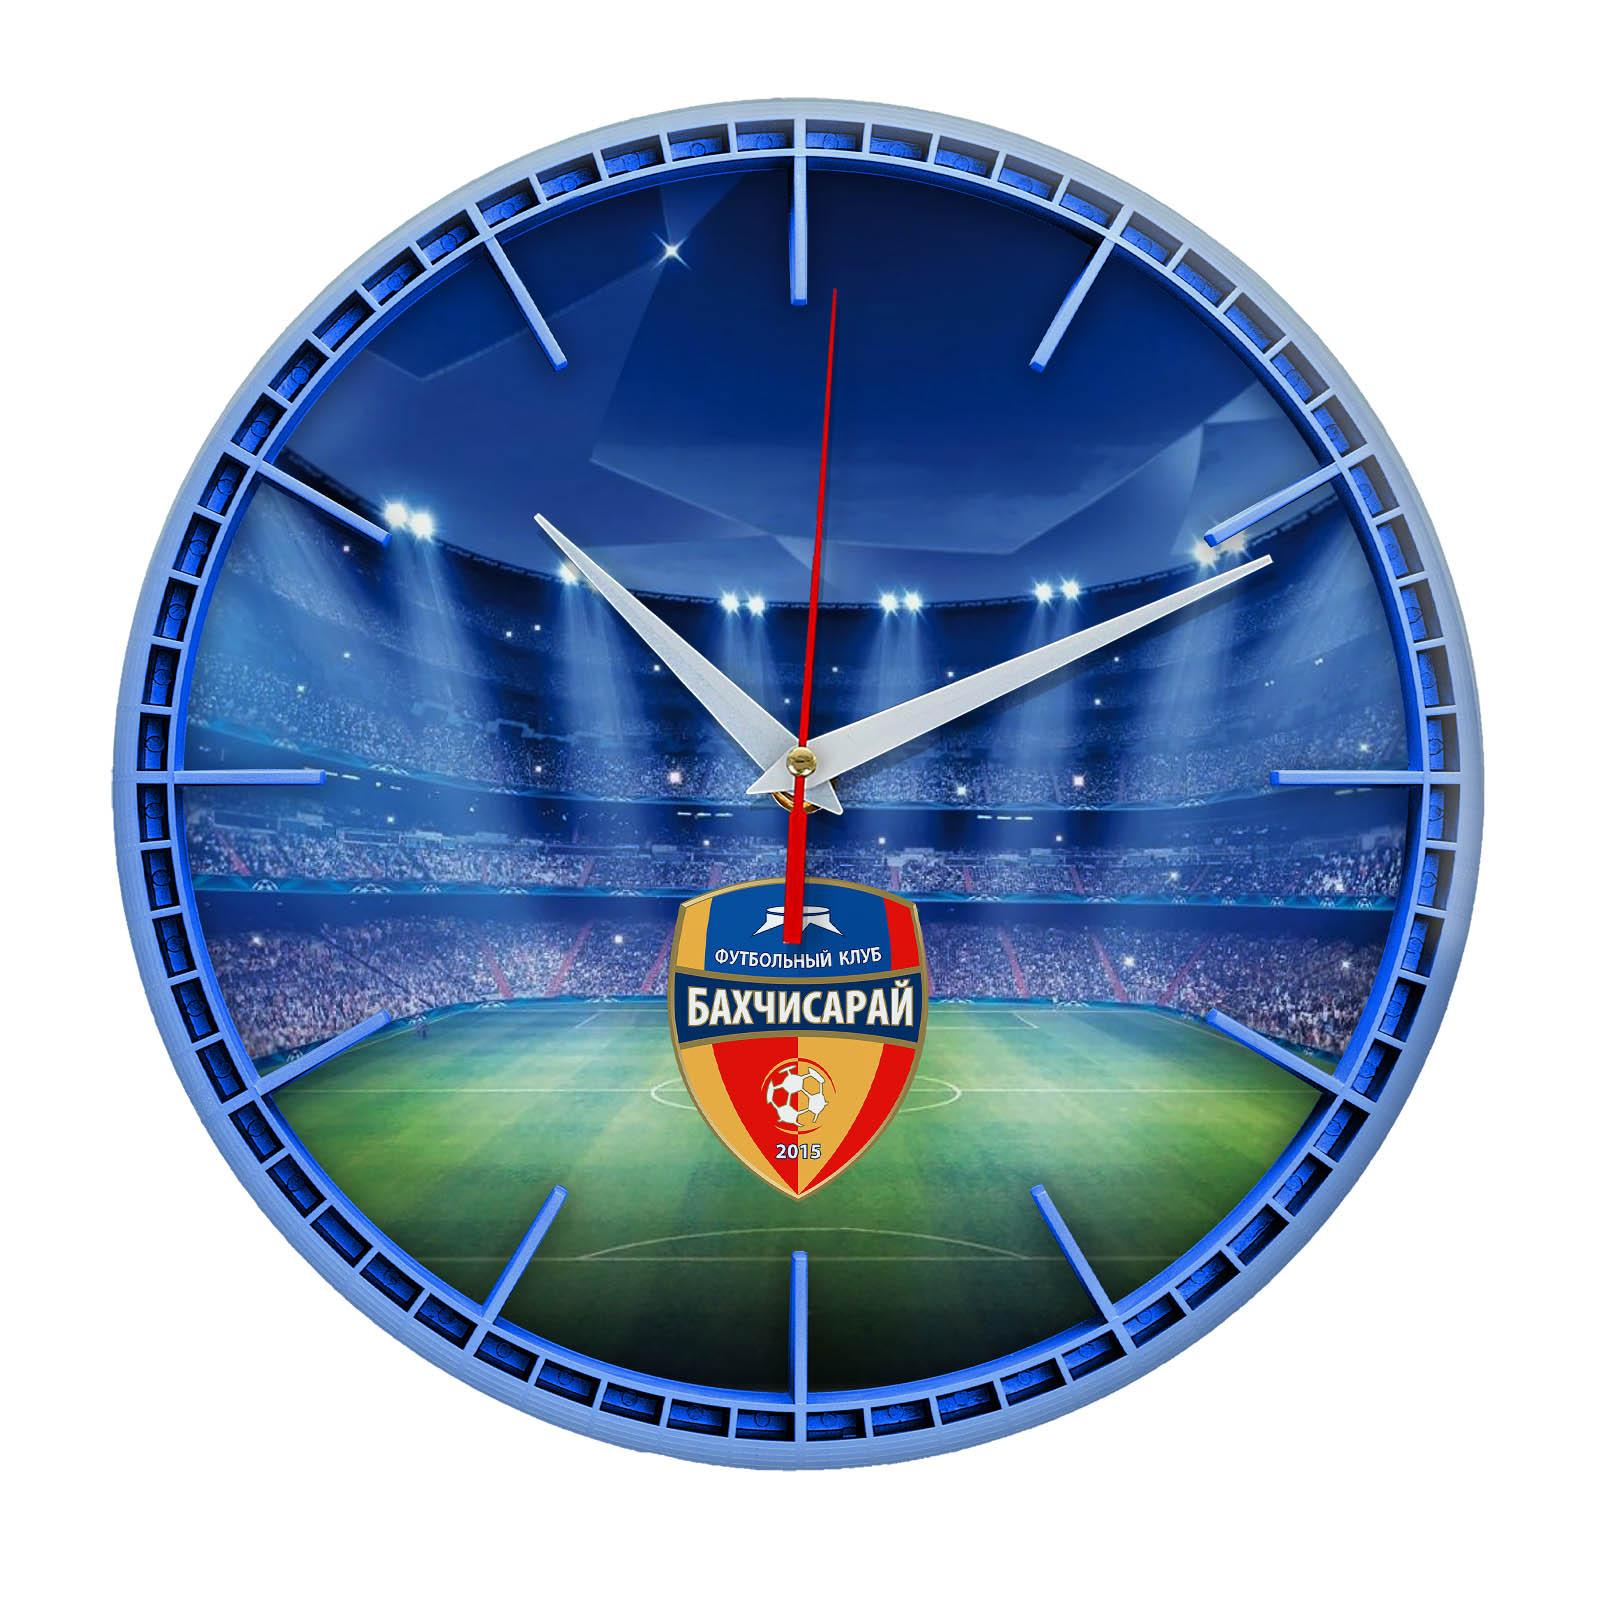 Настенные часы «Сувенир для фаната BAKHCHISARAY»